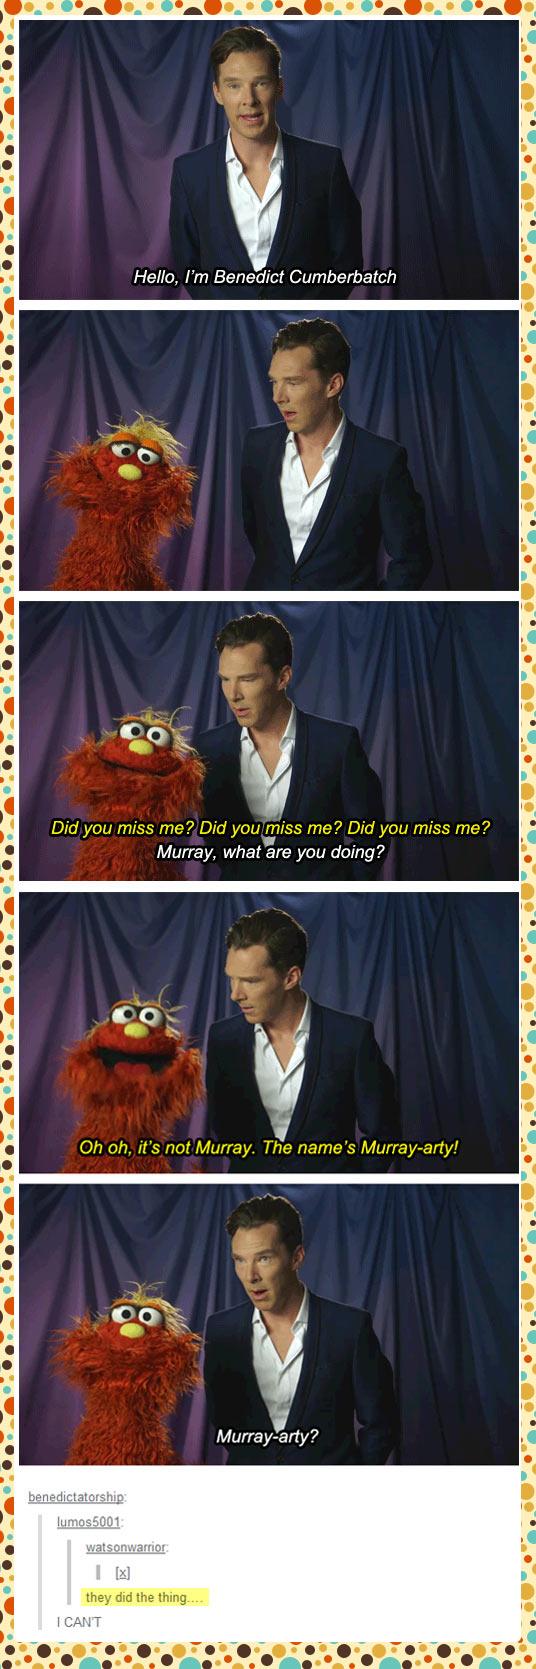 funny-Benedict-Cumberbatch-Murray-Muppet